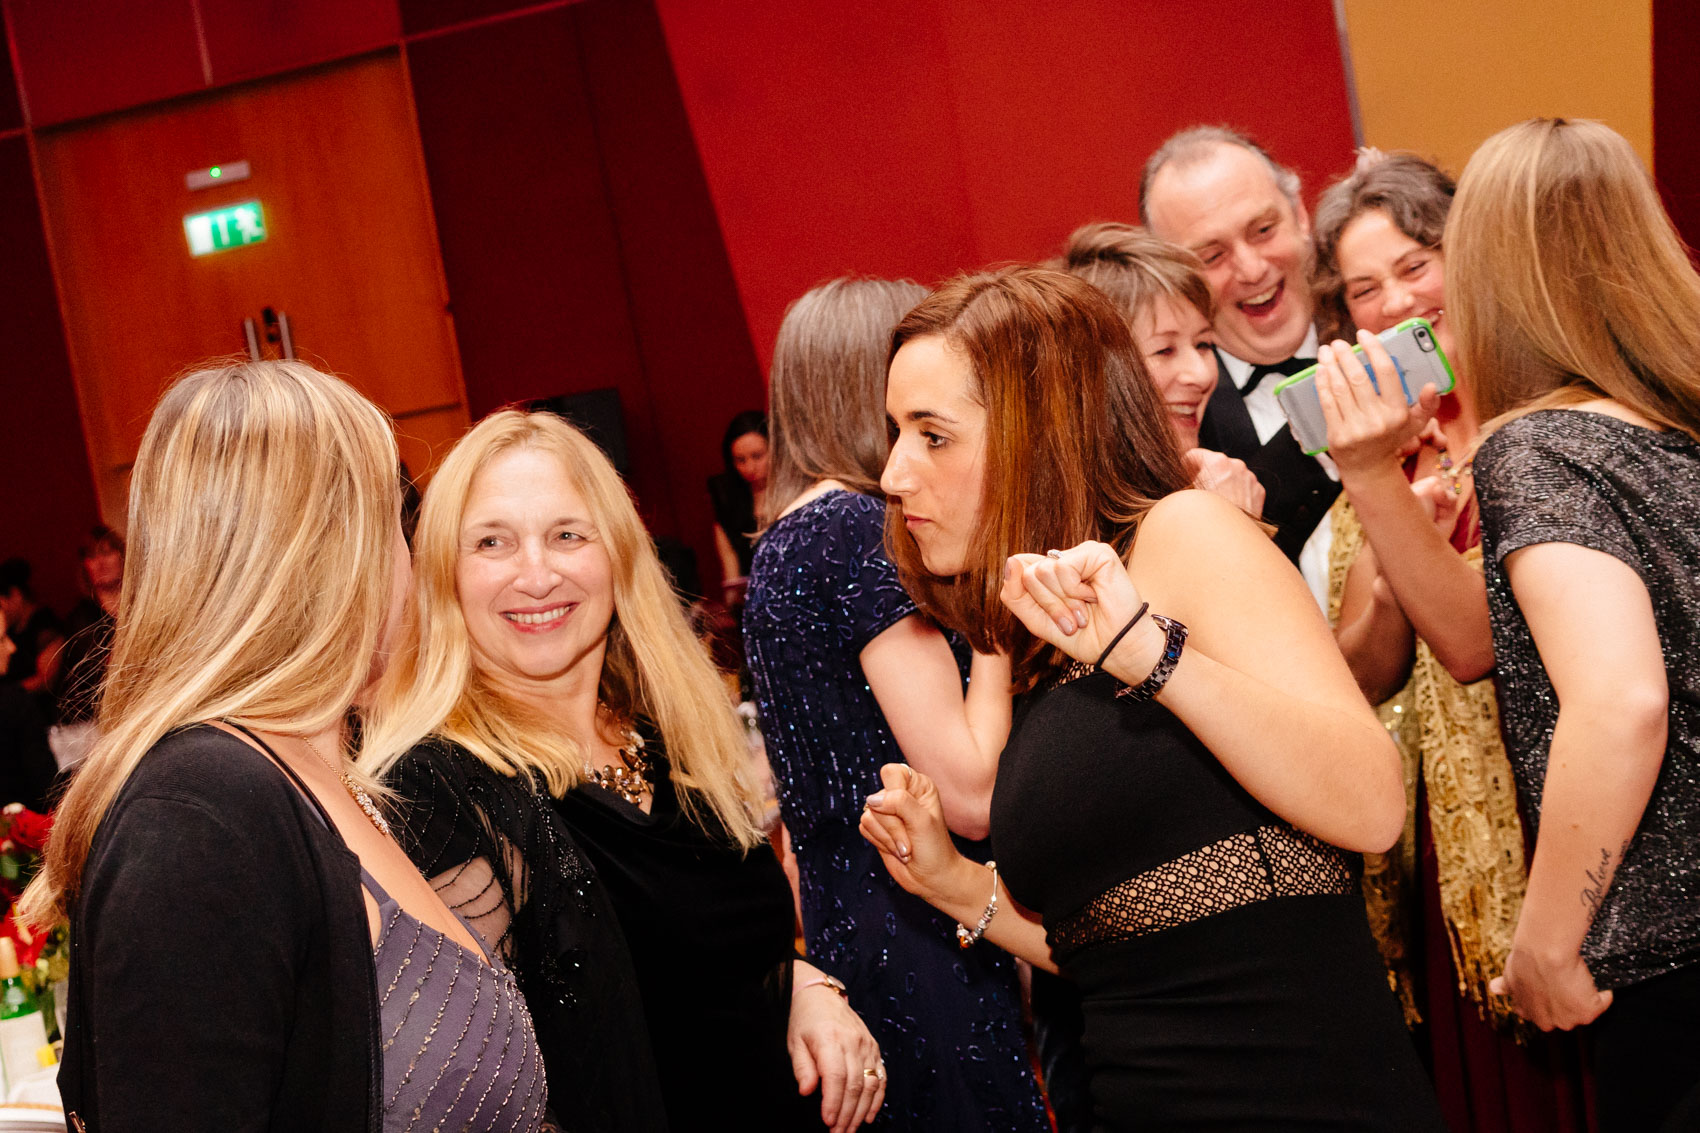 nmt-awards-2015_11_28-1376-125395-033.jpg